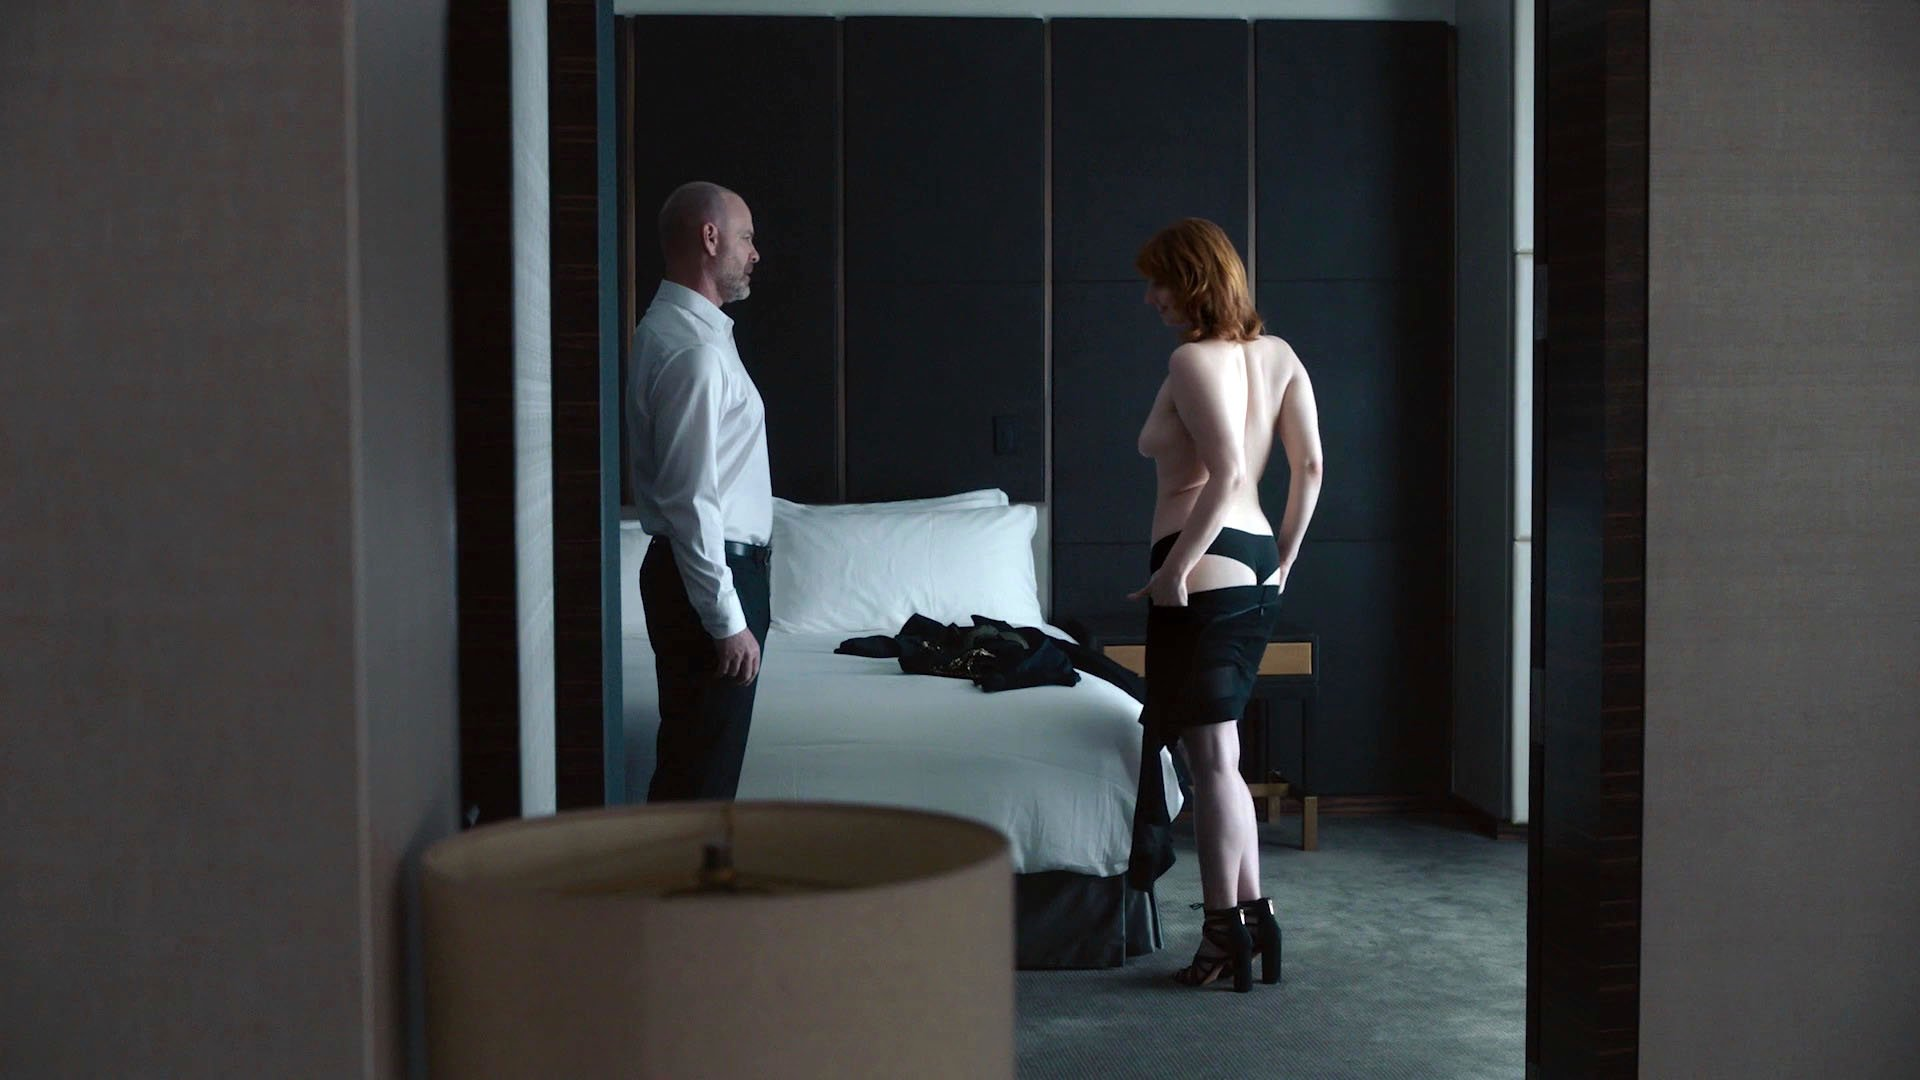 Louisa Krause nude, Gillian Williams nude - The Girlfriend Experience s02e01 (2017)